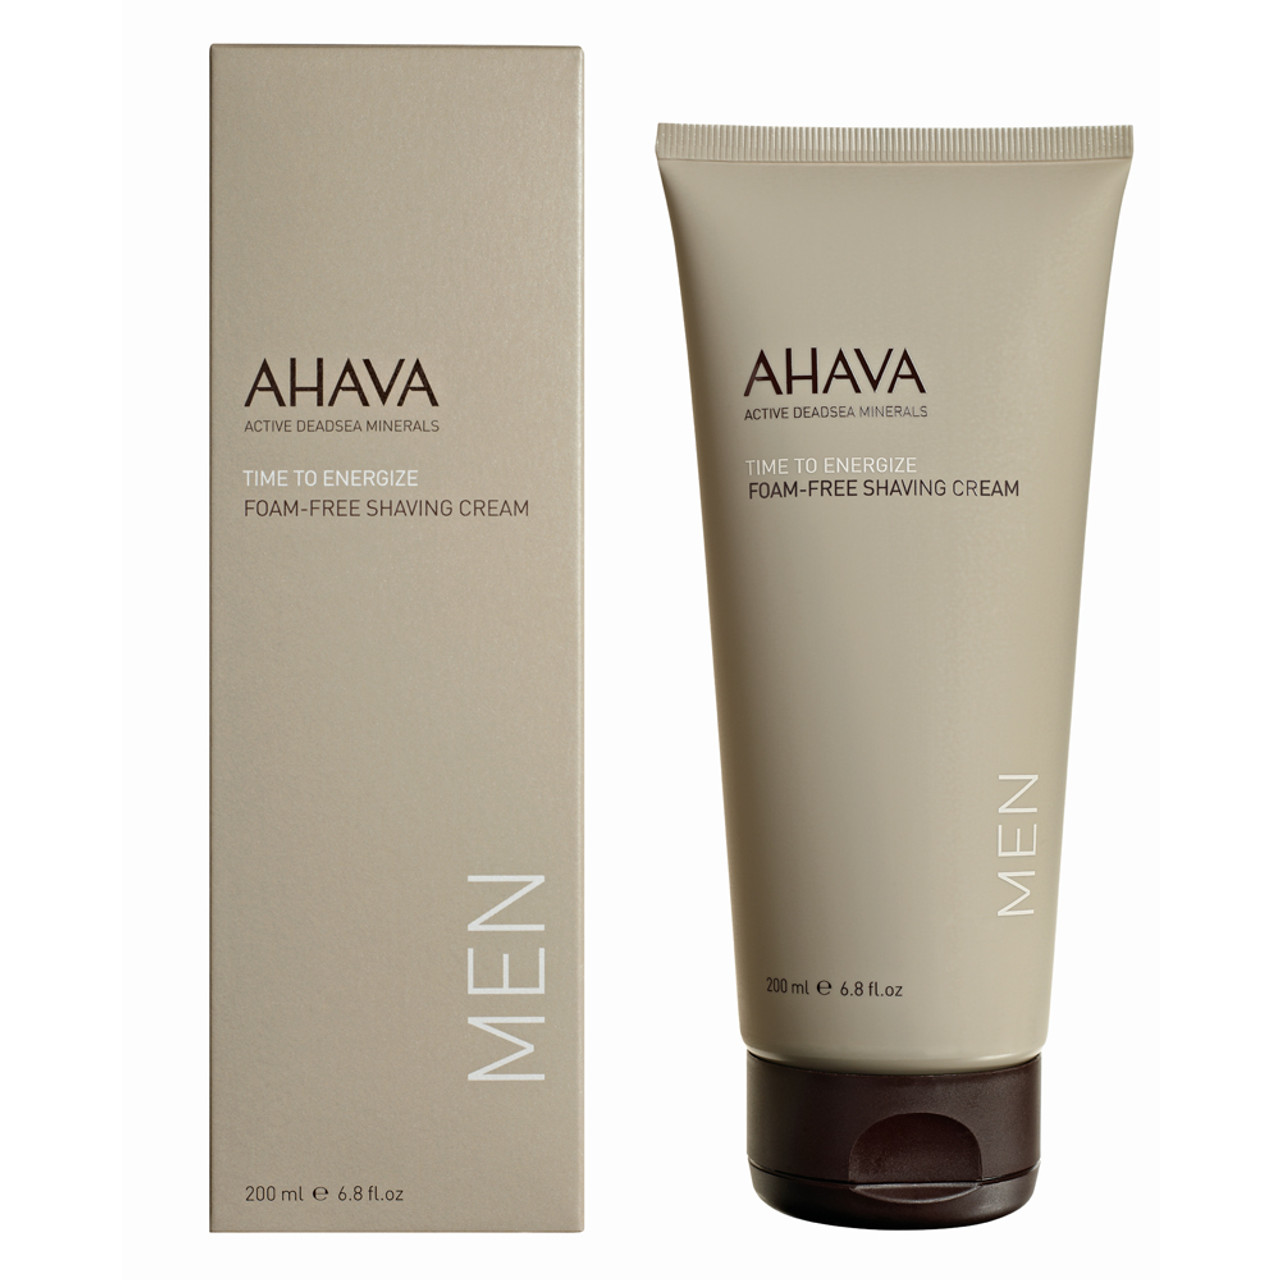 AHAVA Men's Foam Free Shaving Cream BeautifiedYou.com